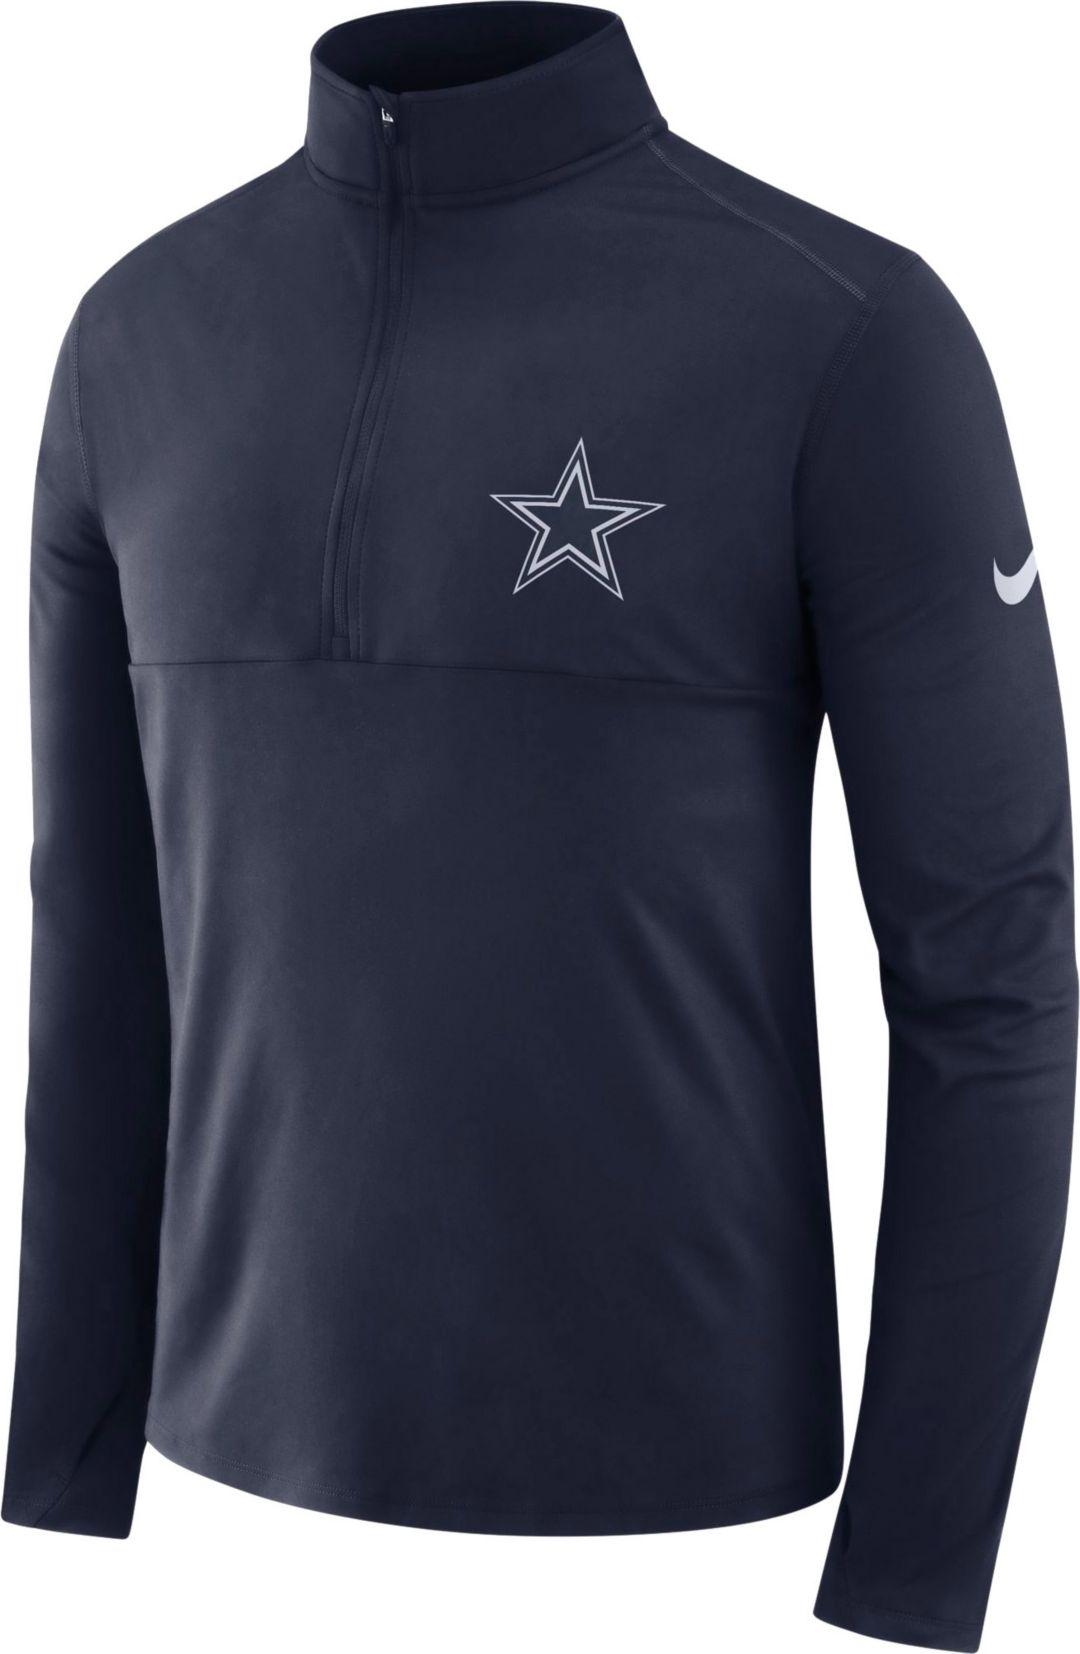 quality design c1b87 7fd65 Nike Men's Dallas Cowboys Core Performance Navy Half-Zip Pullover Top